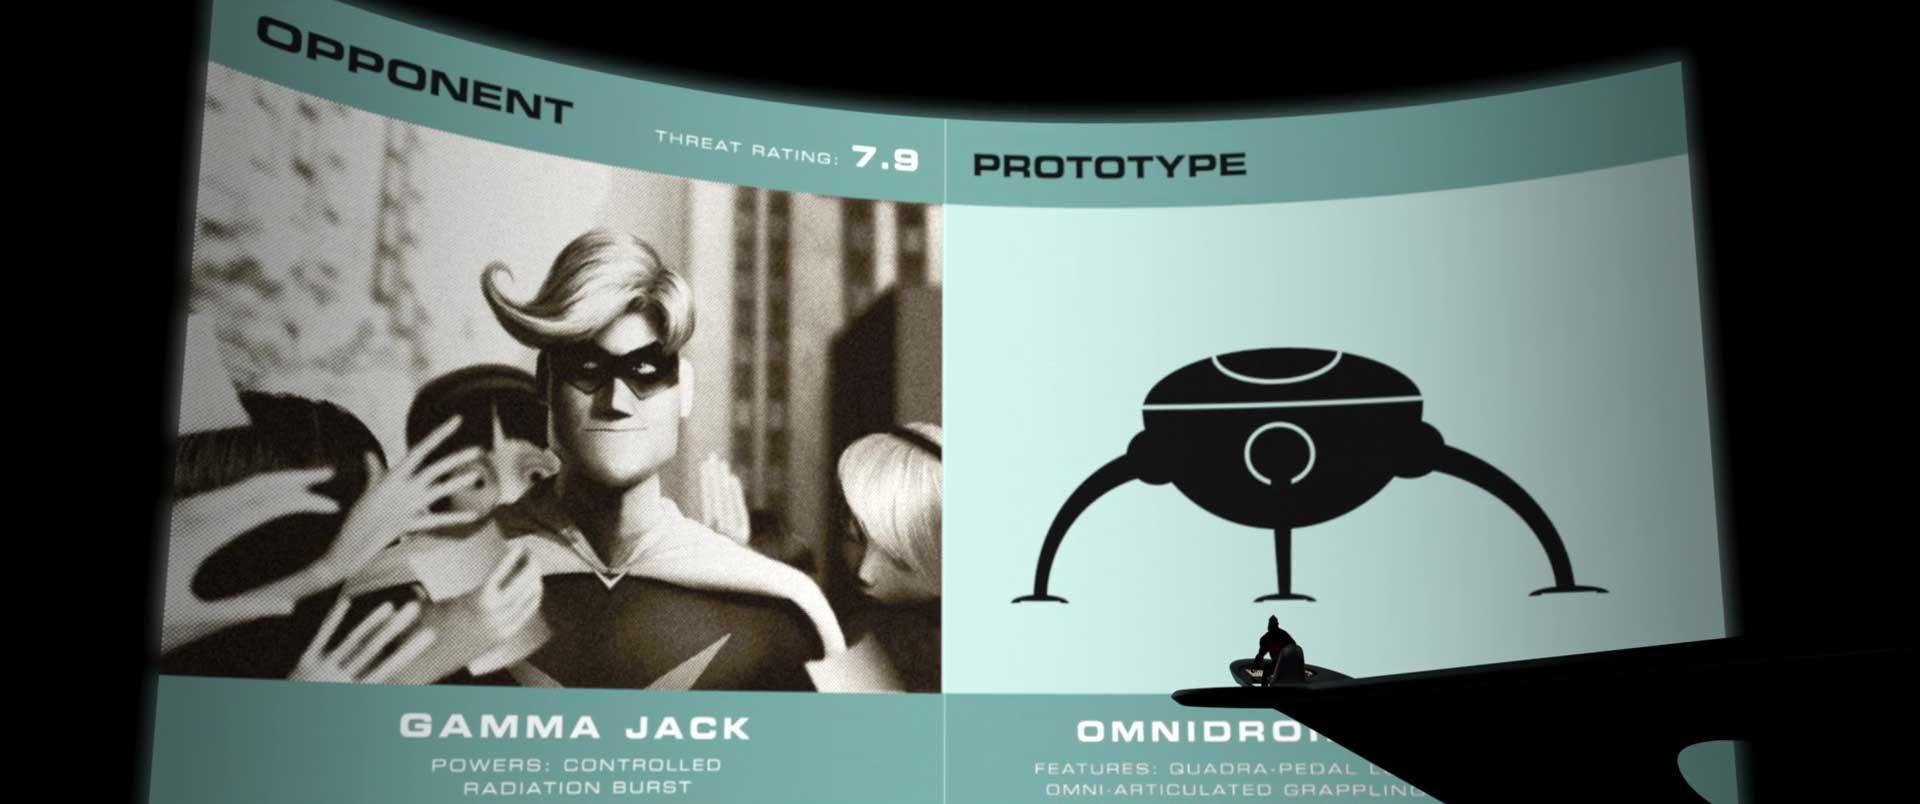 gamma-jack-personnage-les-indestructibles-01